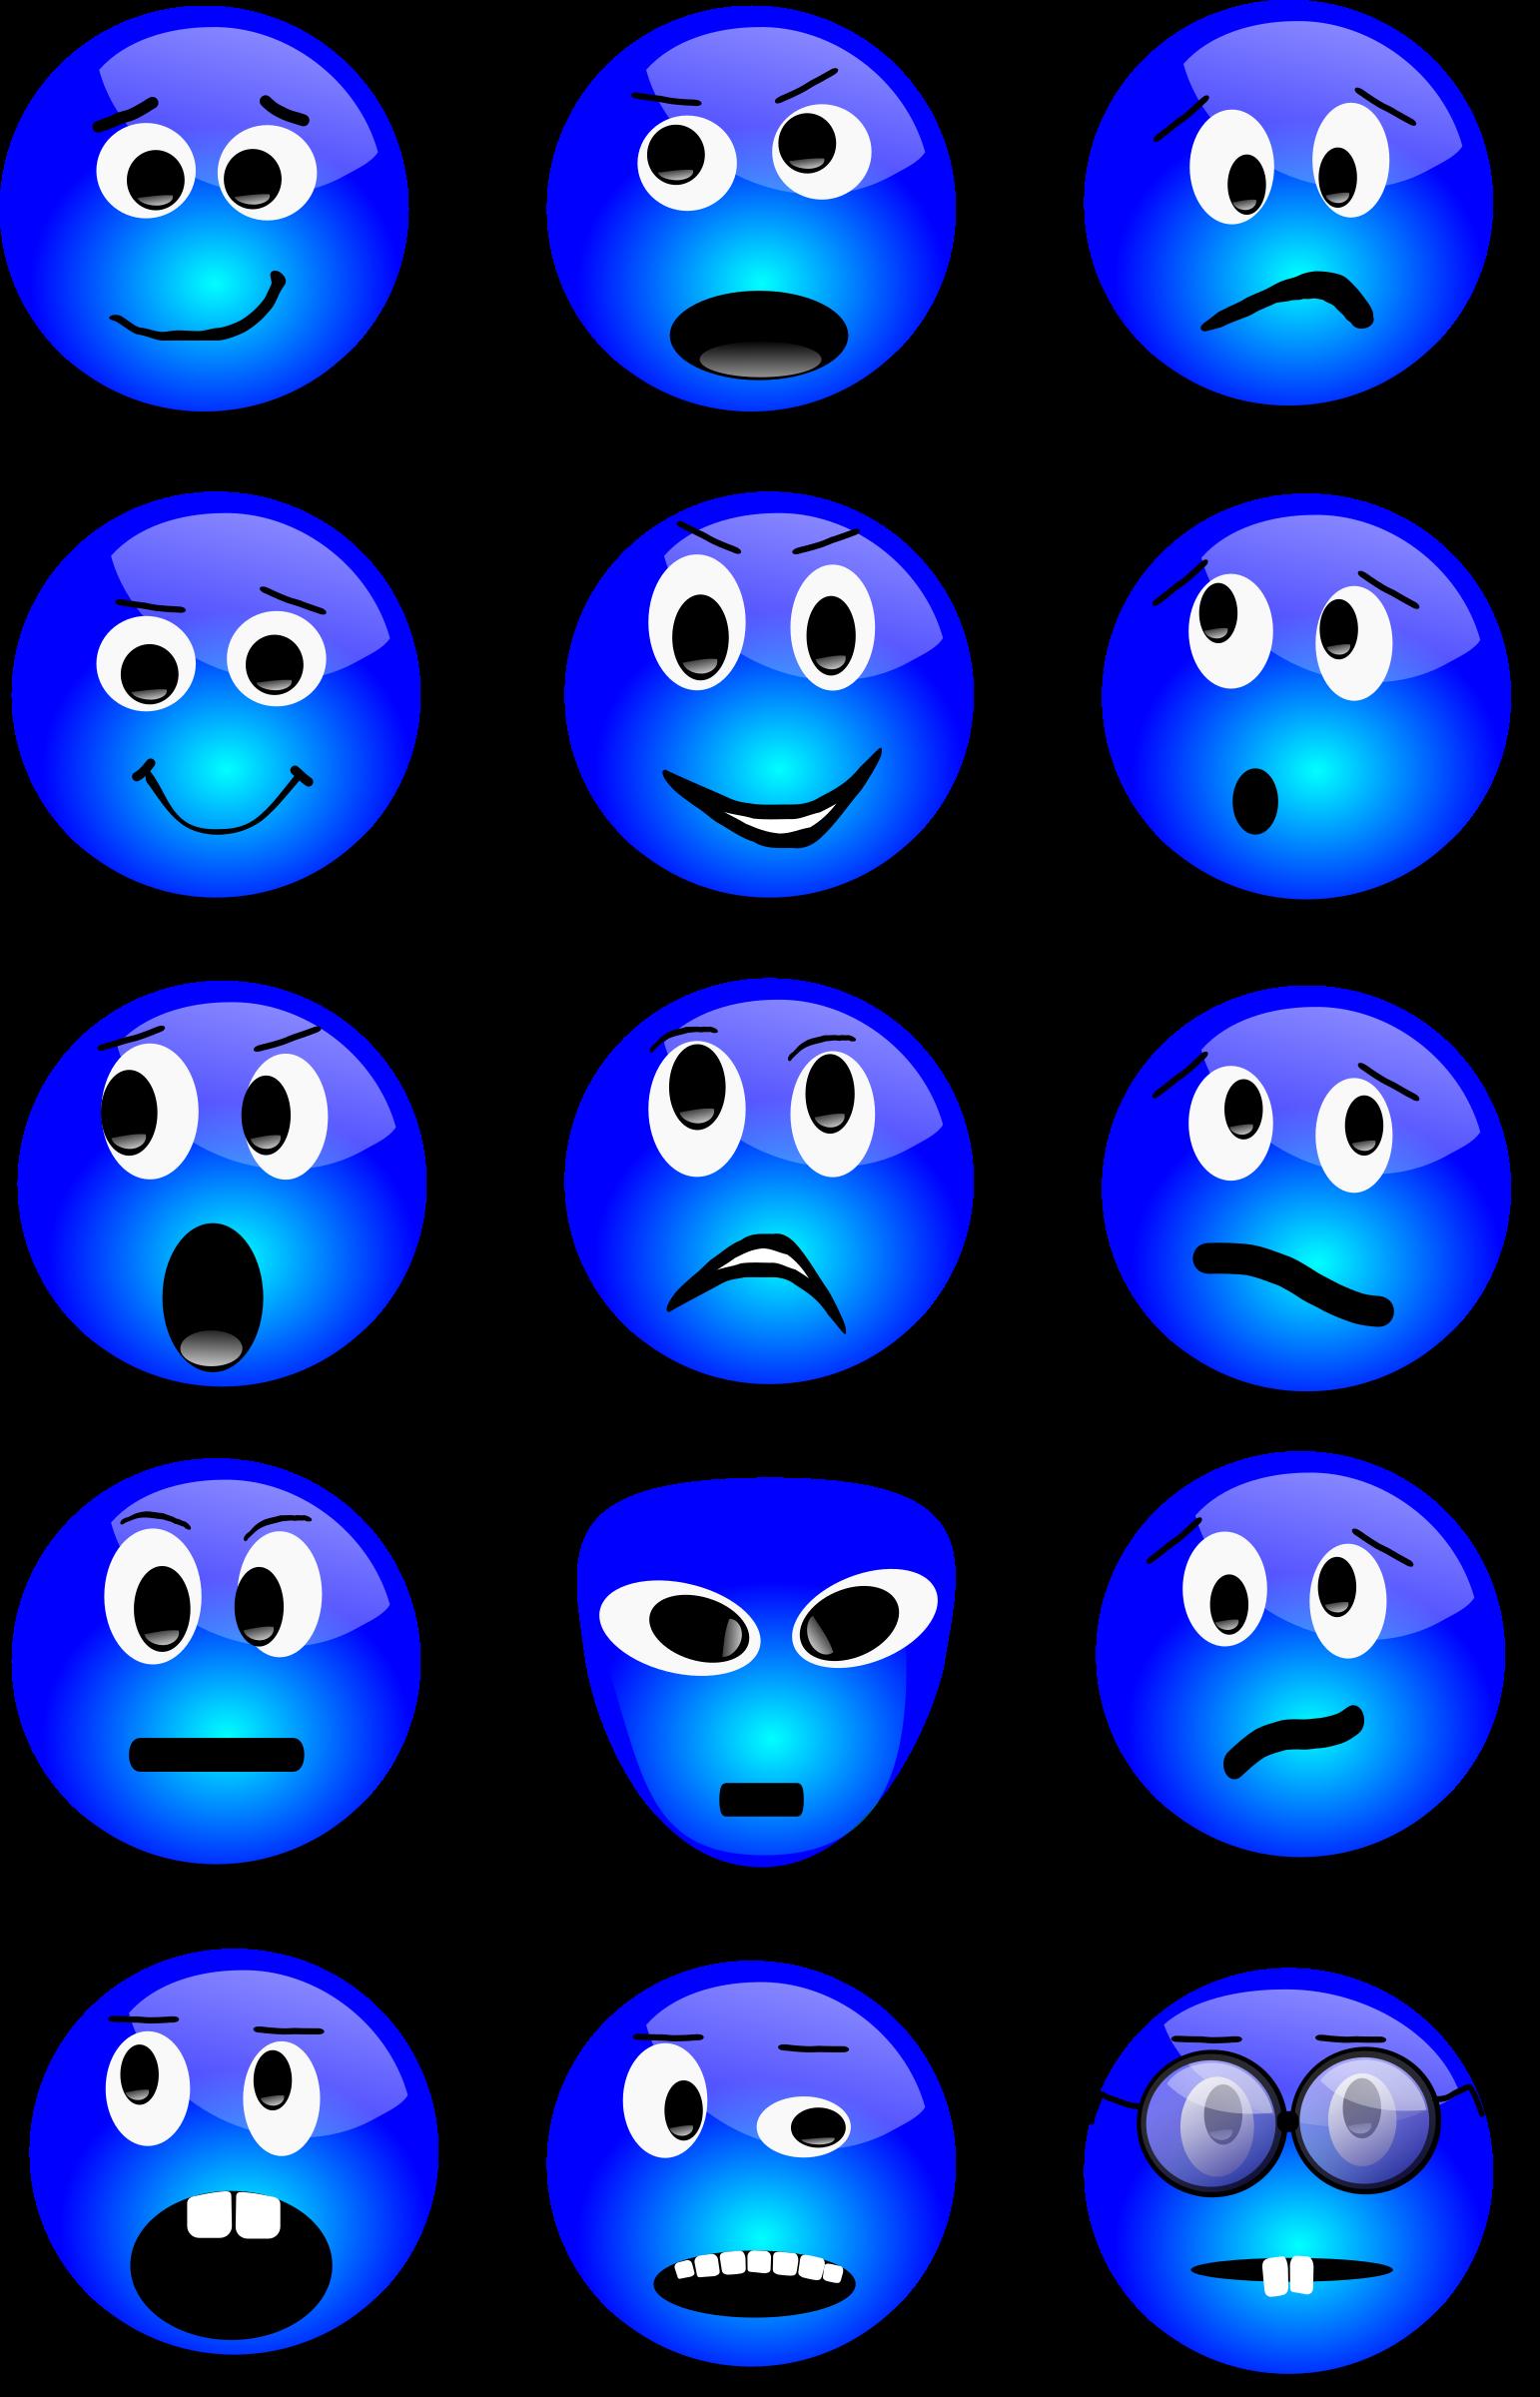 Smiley face big image. Faces clipart basic emotion